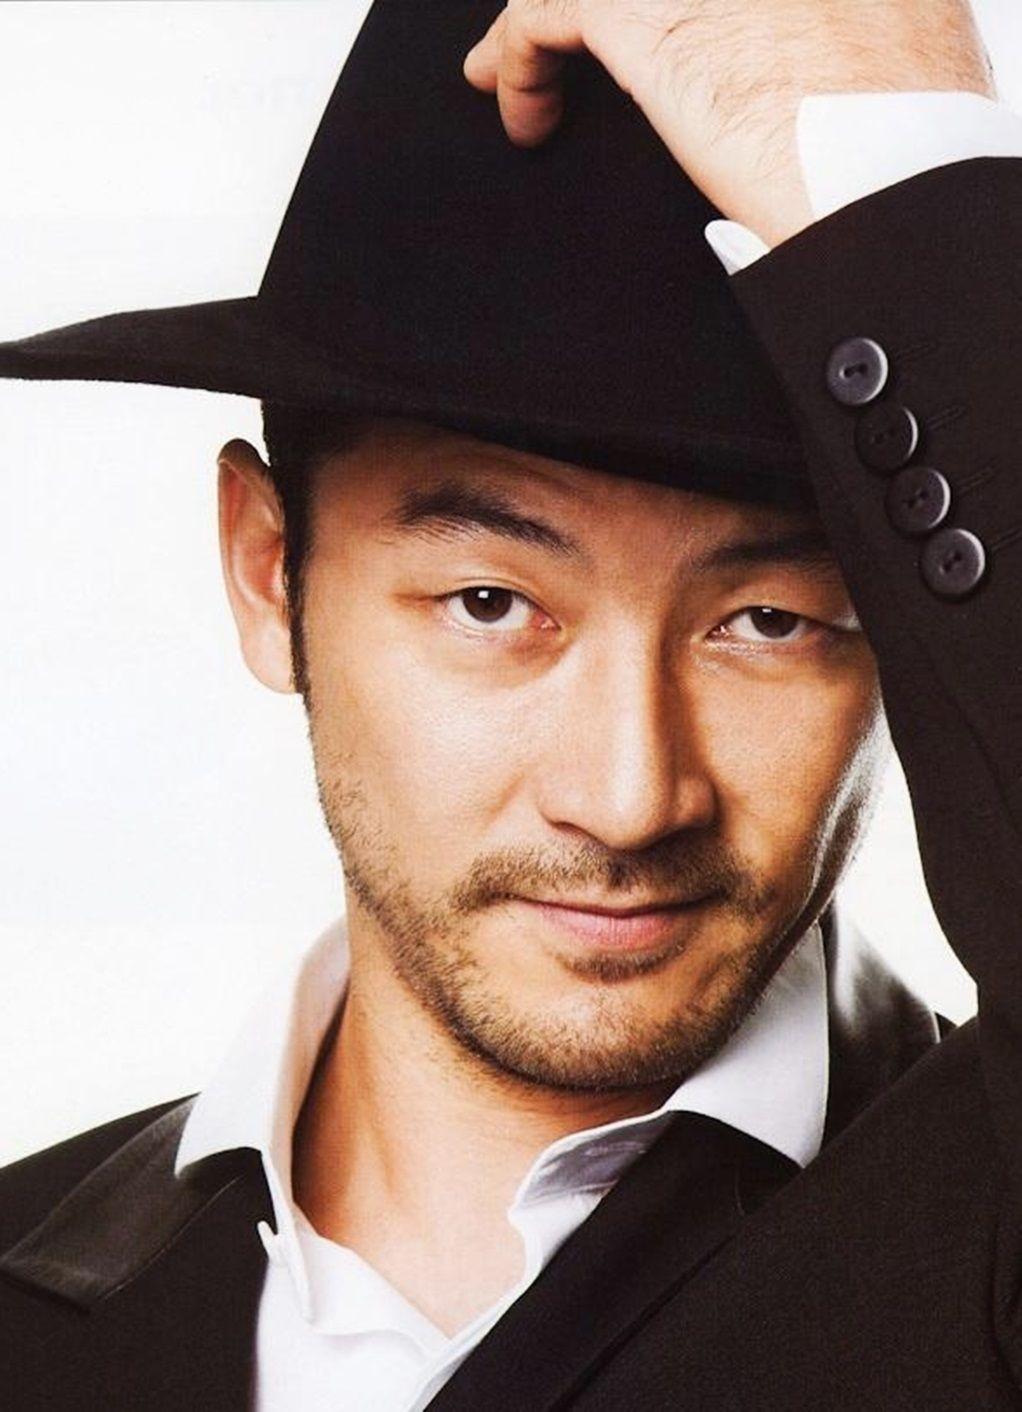 Best known for his sadistic portrayal of kakihara in ichi the killer, tadanobu asano, born tadanobu sato, started his acting career at the young age of 16. Pin on Asano Tadanobu